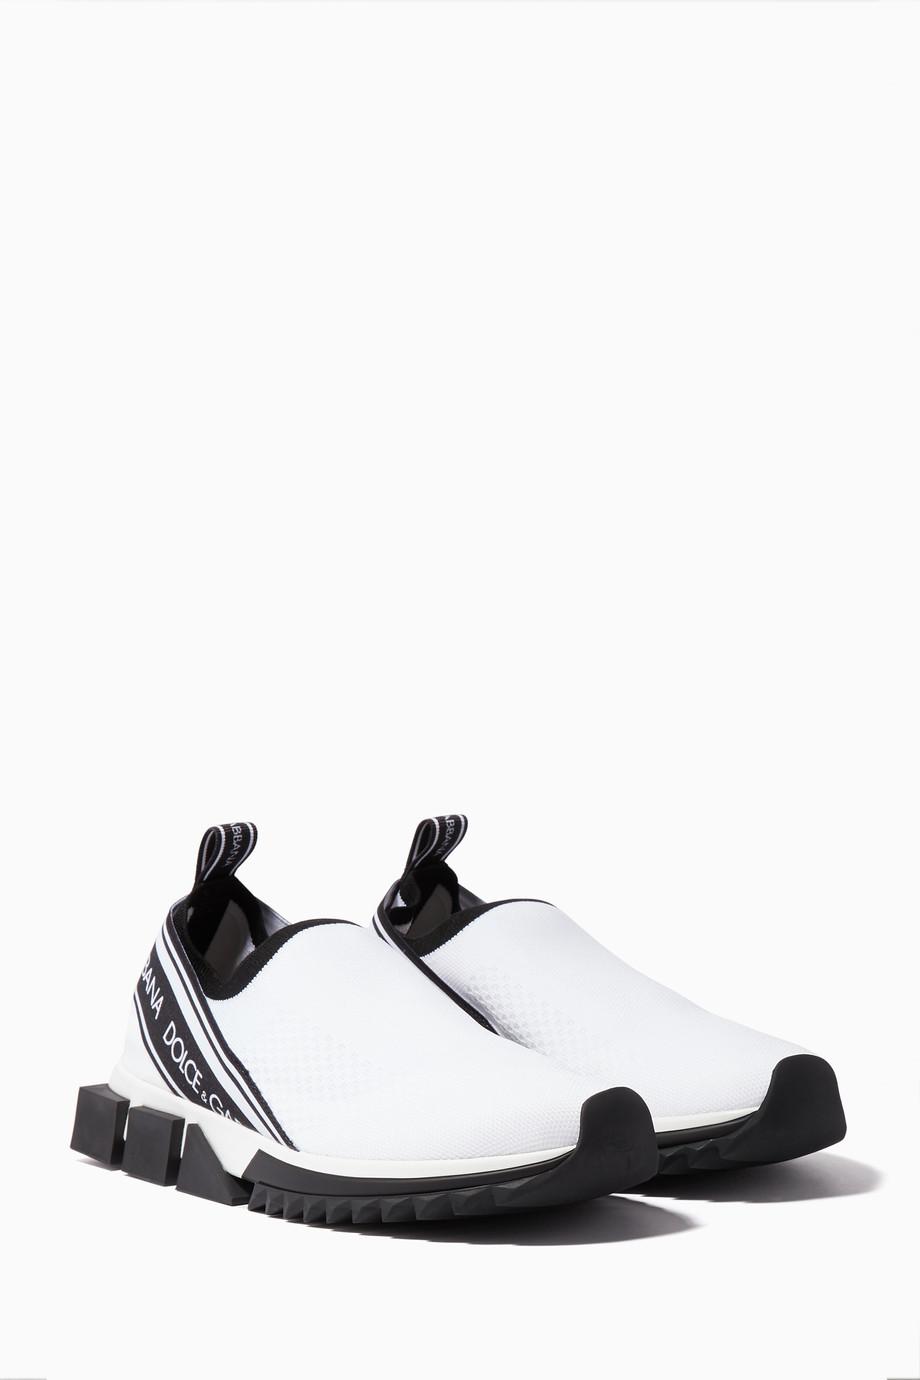 c5b0ab384 تسوق حذاء سنيكرز سورنتو بشعار العلامة أبيض Dolce & Gabbana ابيض ...